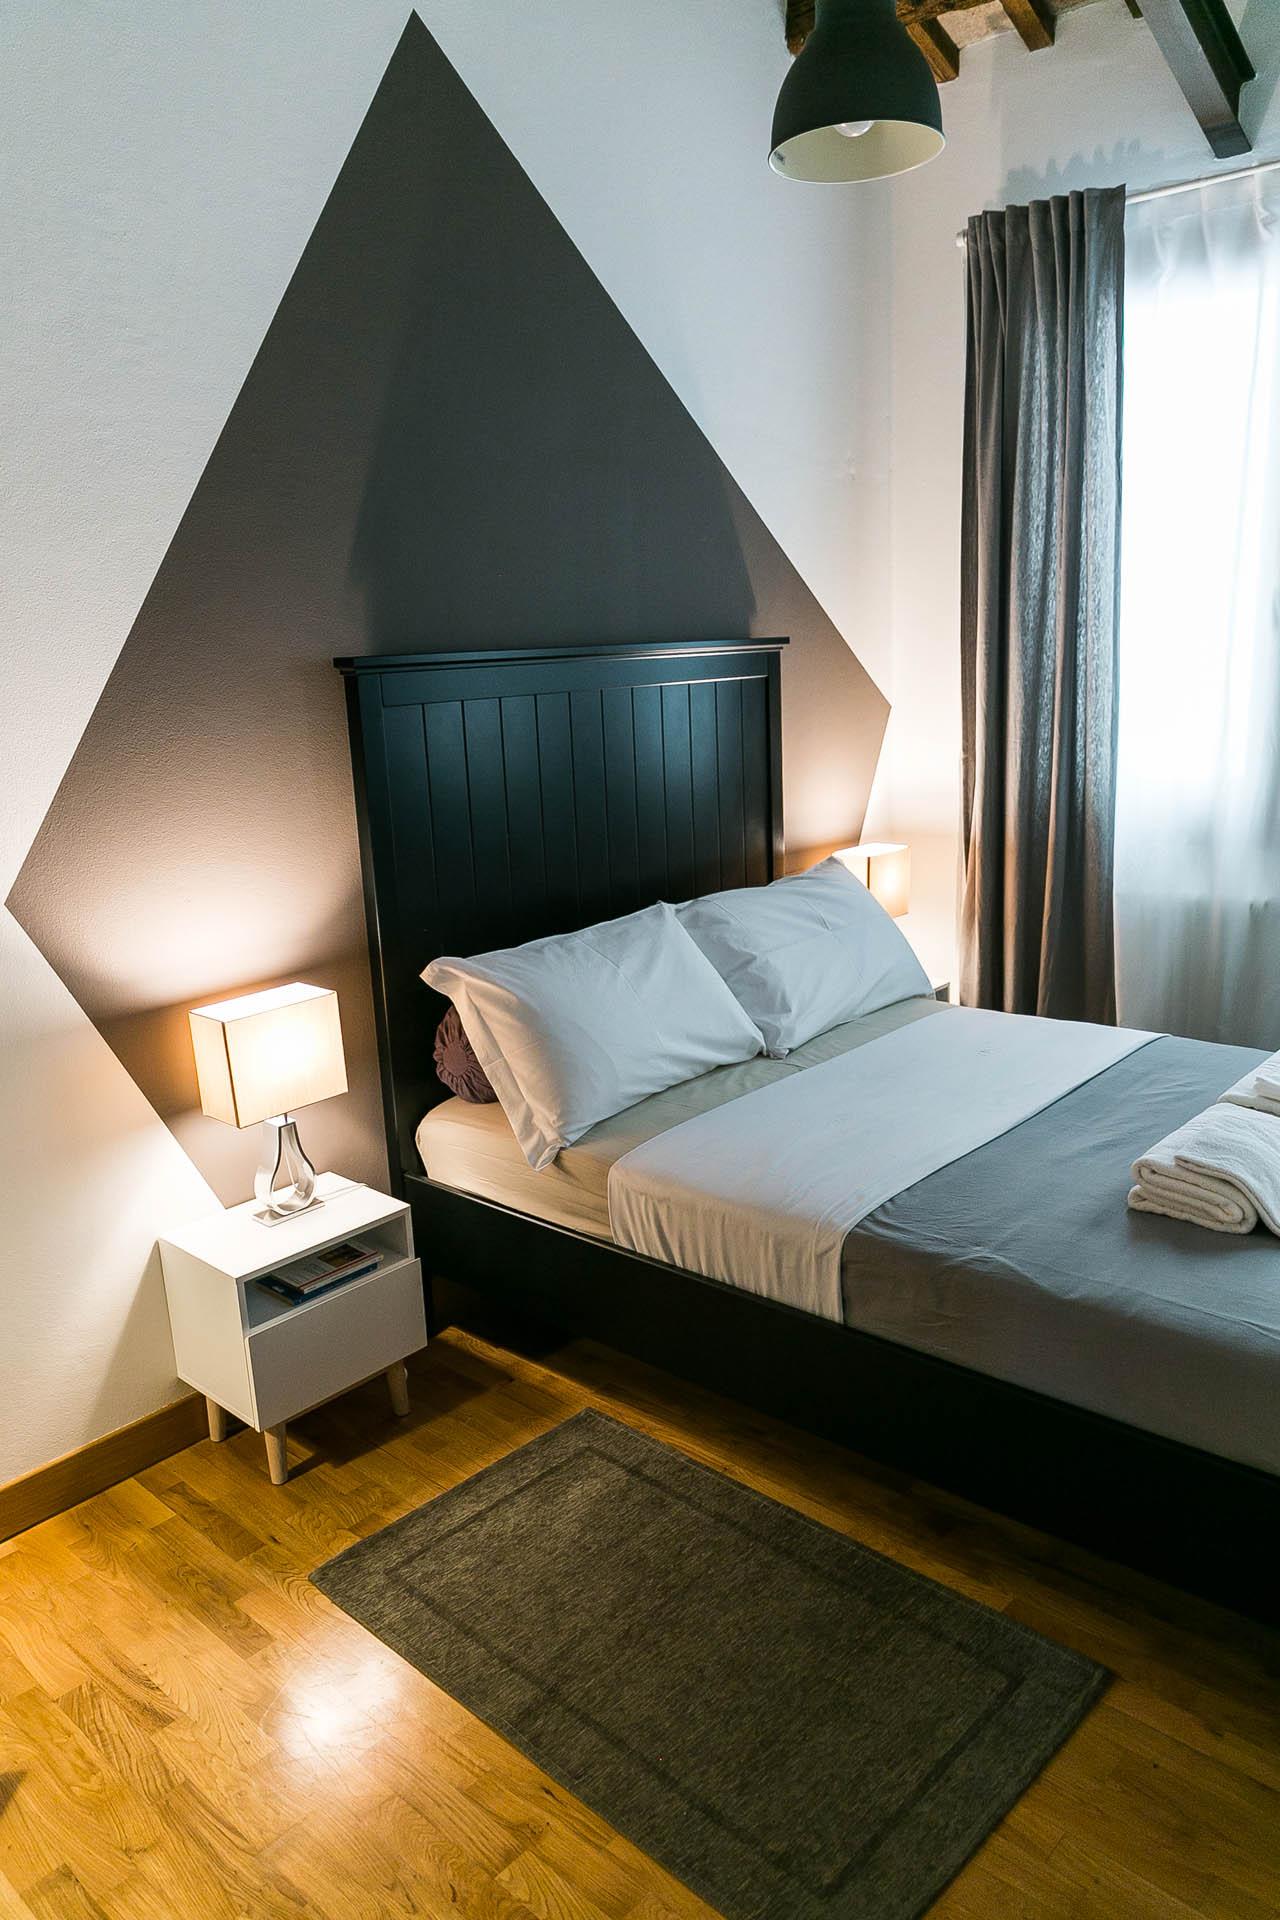 Suite B&B Treviso